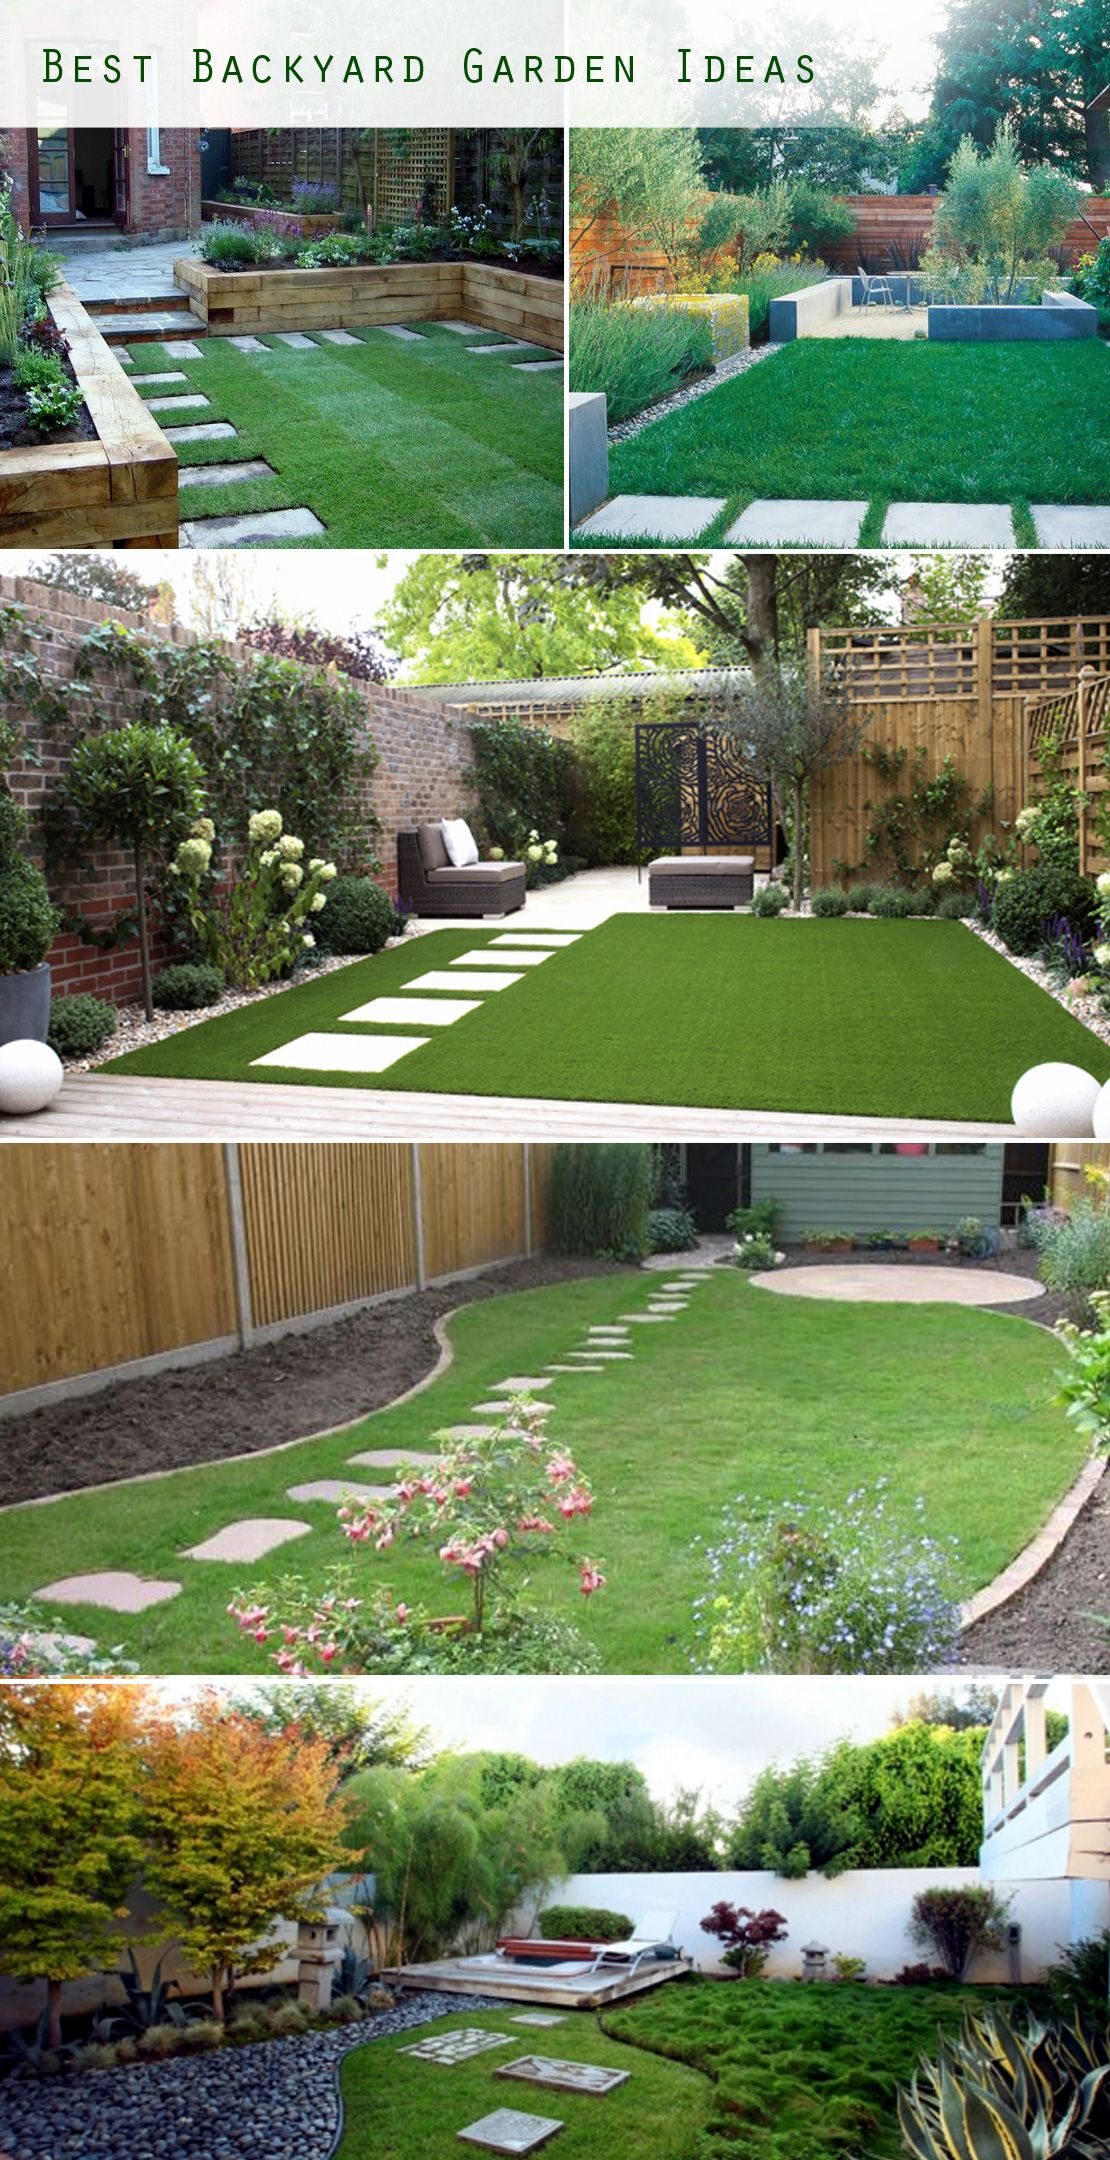 Fantastic Backyard Design and Ideas on a Budget | anifa blog ...